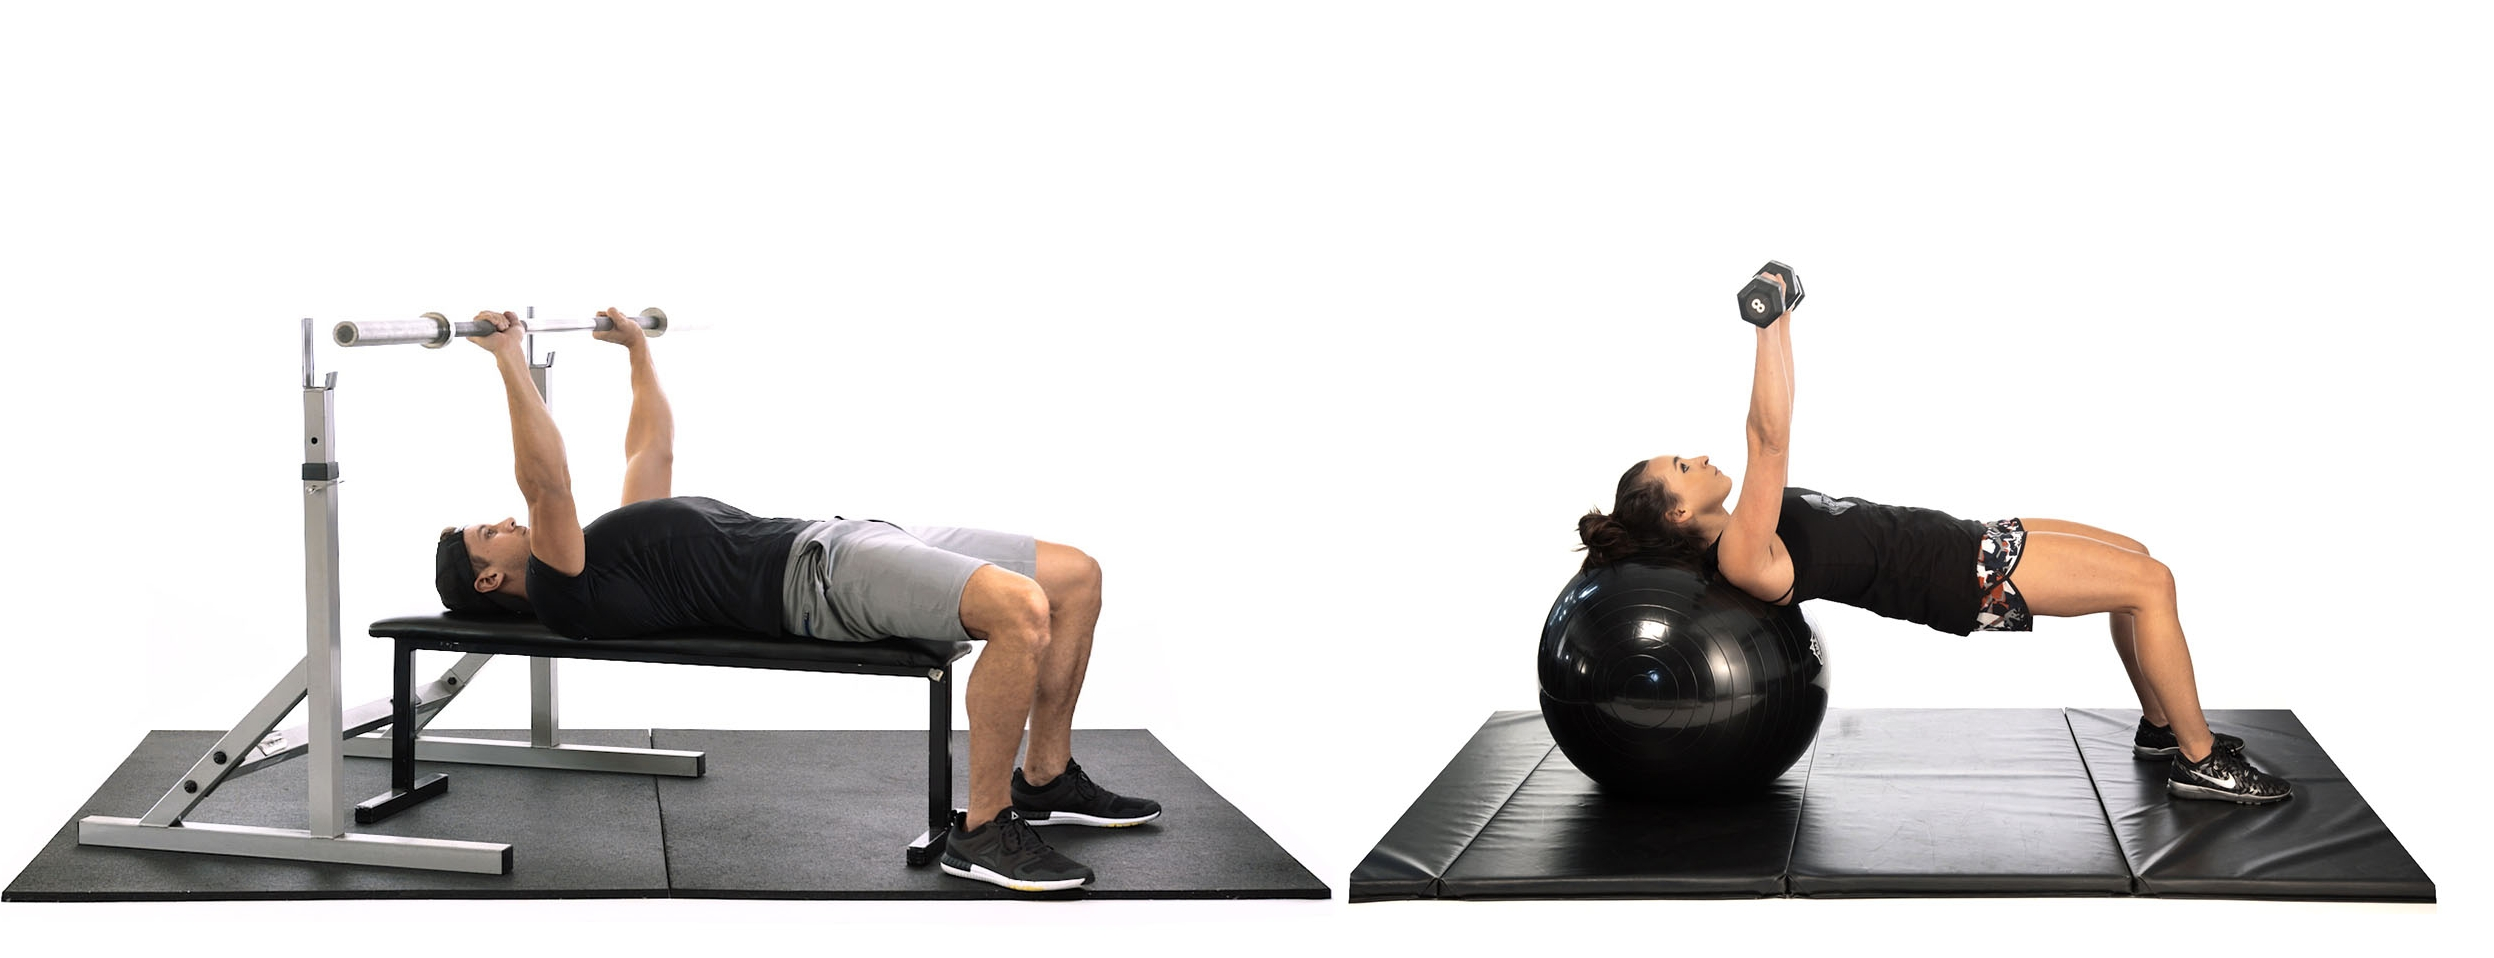 Whole Body Fitness Press